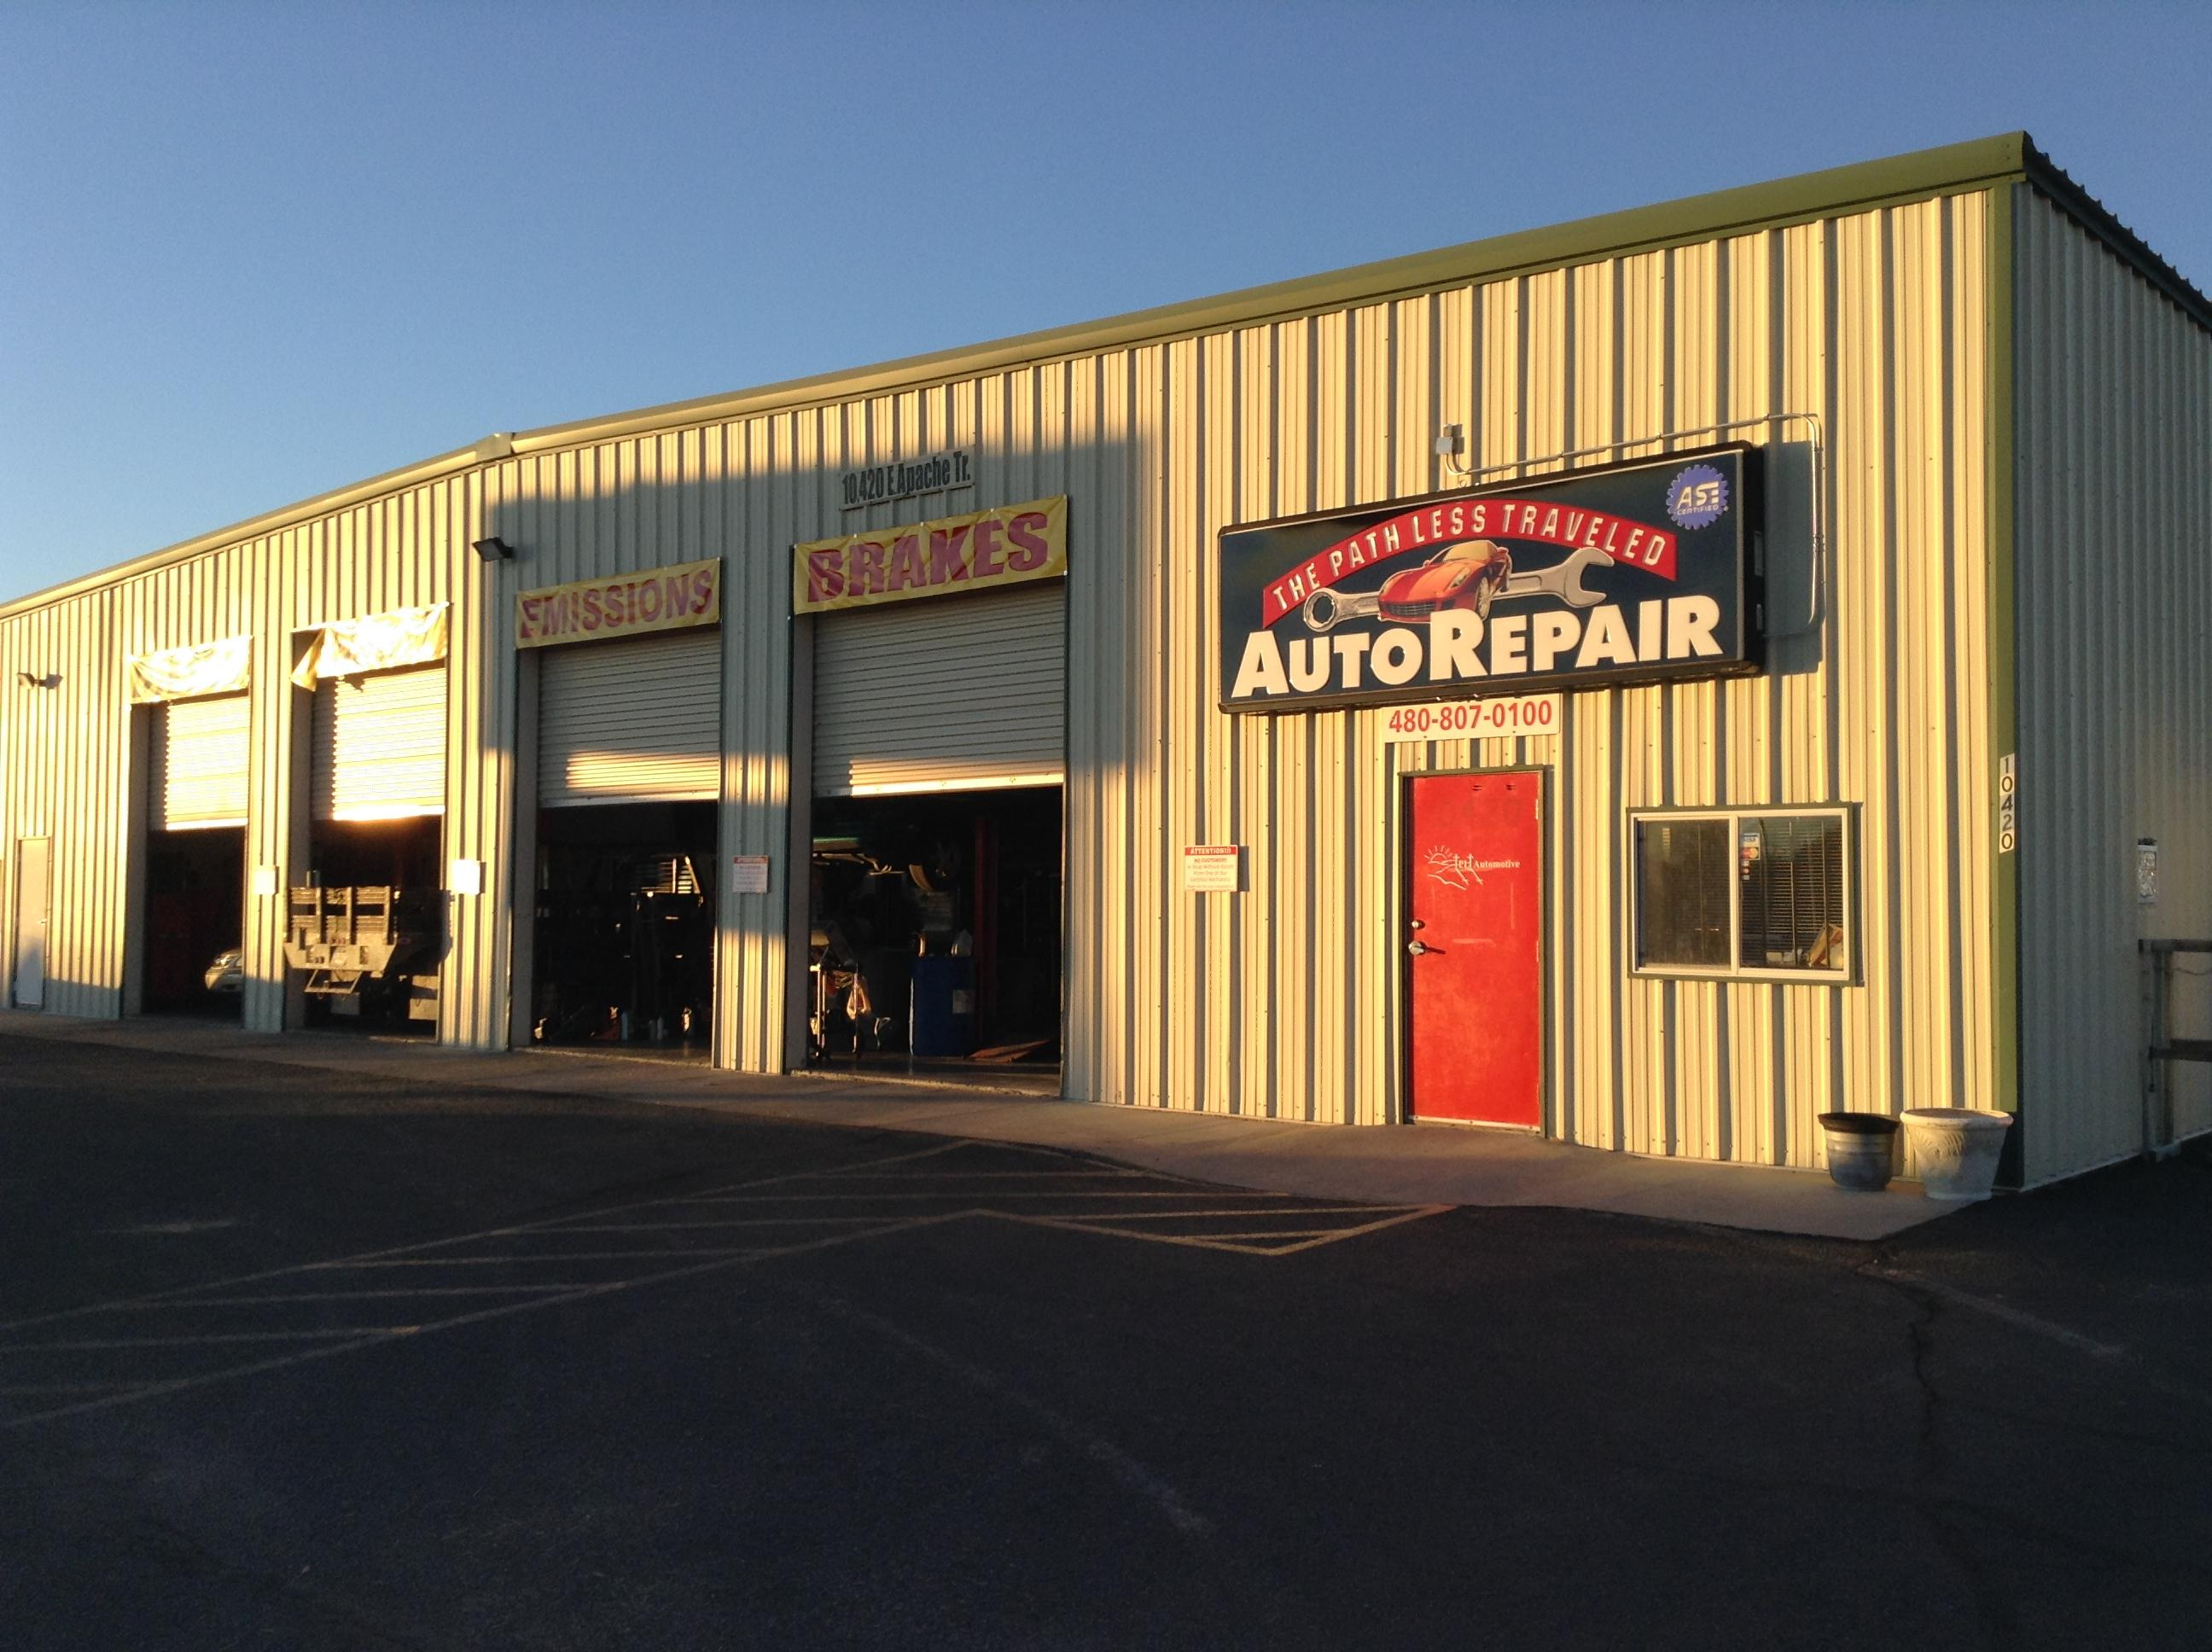 Mobile Mechanic Phoenix AZ  Call 4804284445  Mobile